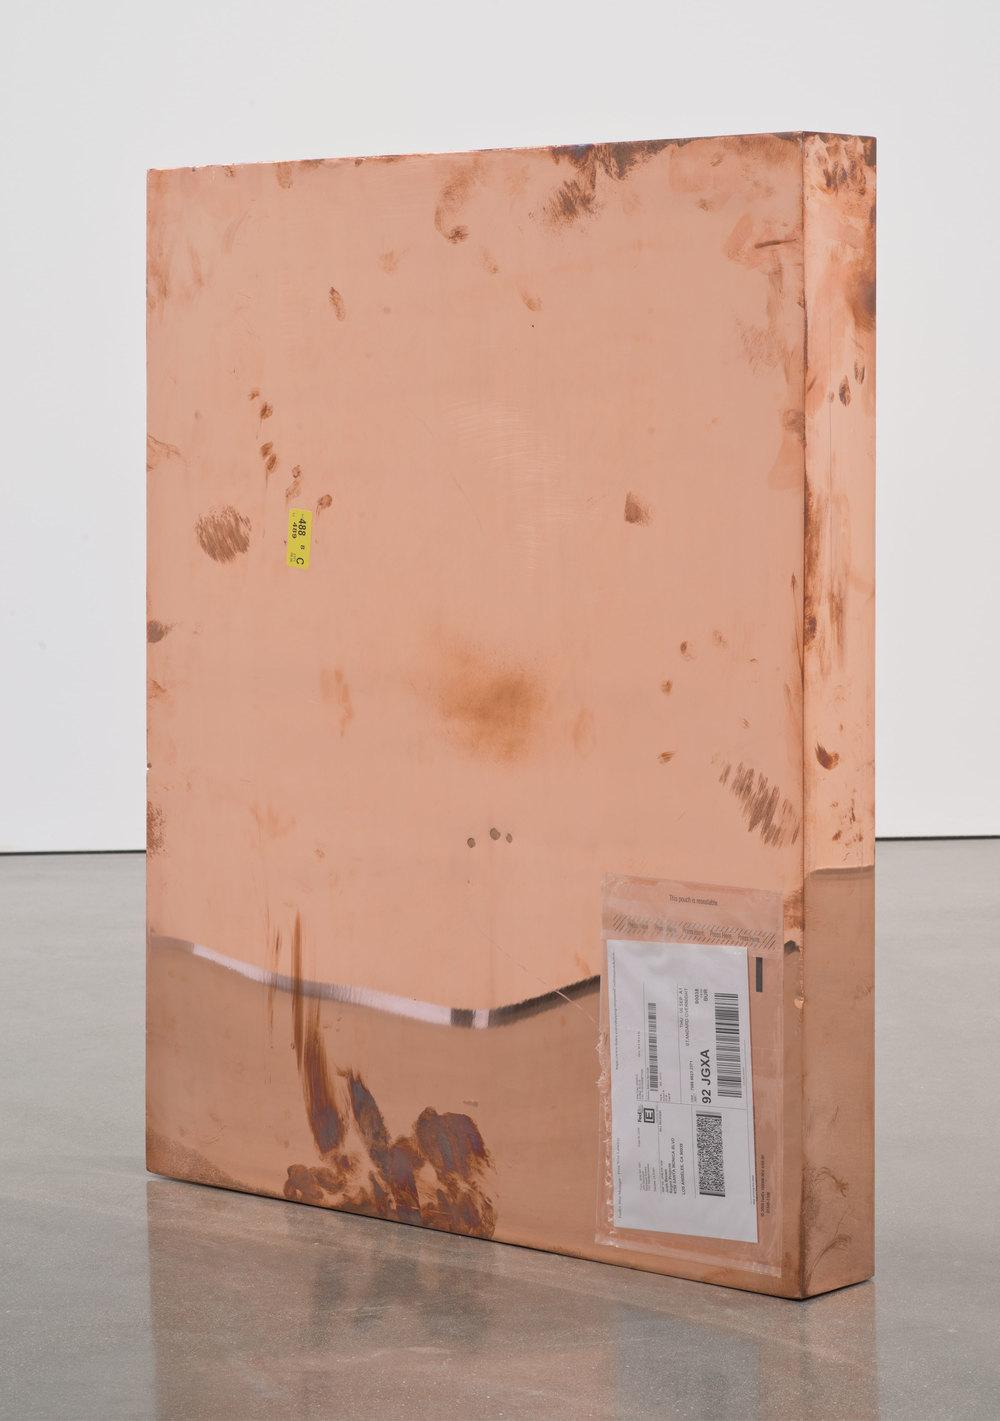 Copper (FedEx® Medium Framed Art Box  © 2011 FedEx 163095 REV 7/11), Standard Overnight, Glendale–Los Angeles trk#798886232371, September 5–6, 2012    2012–   Polished copper, accrued FedEx shipping and tracking labels  33 3/4 x 28 x 4 inches